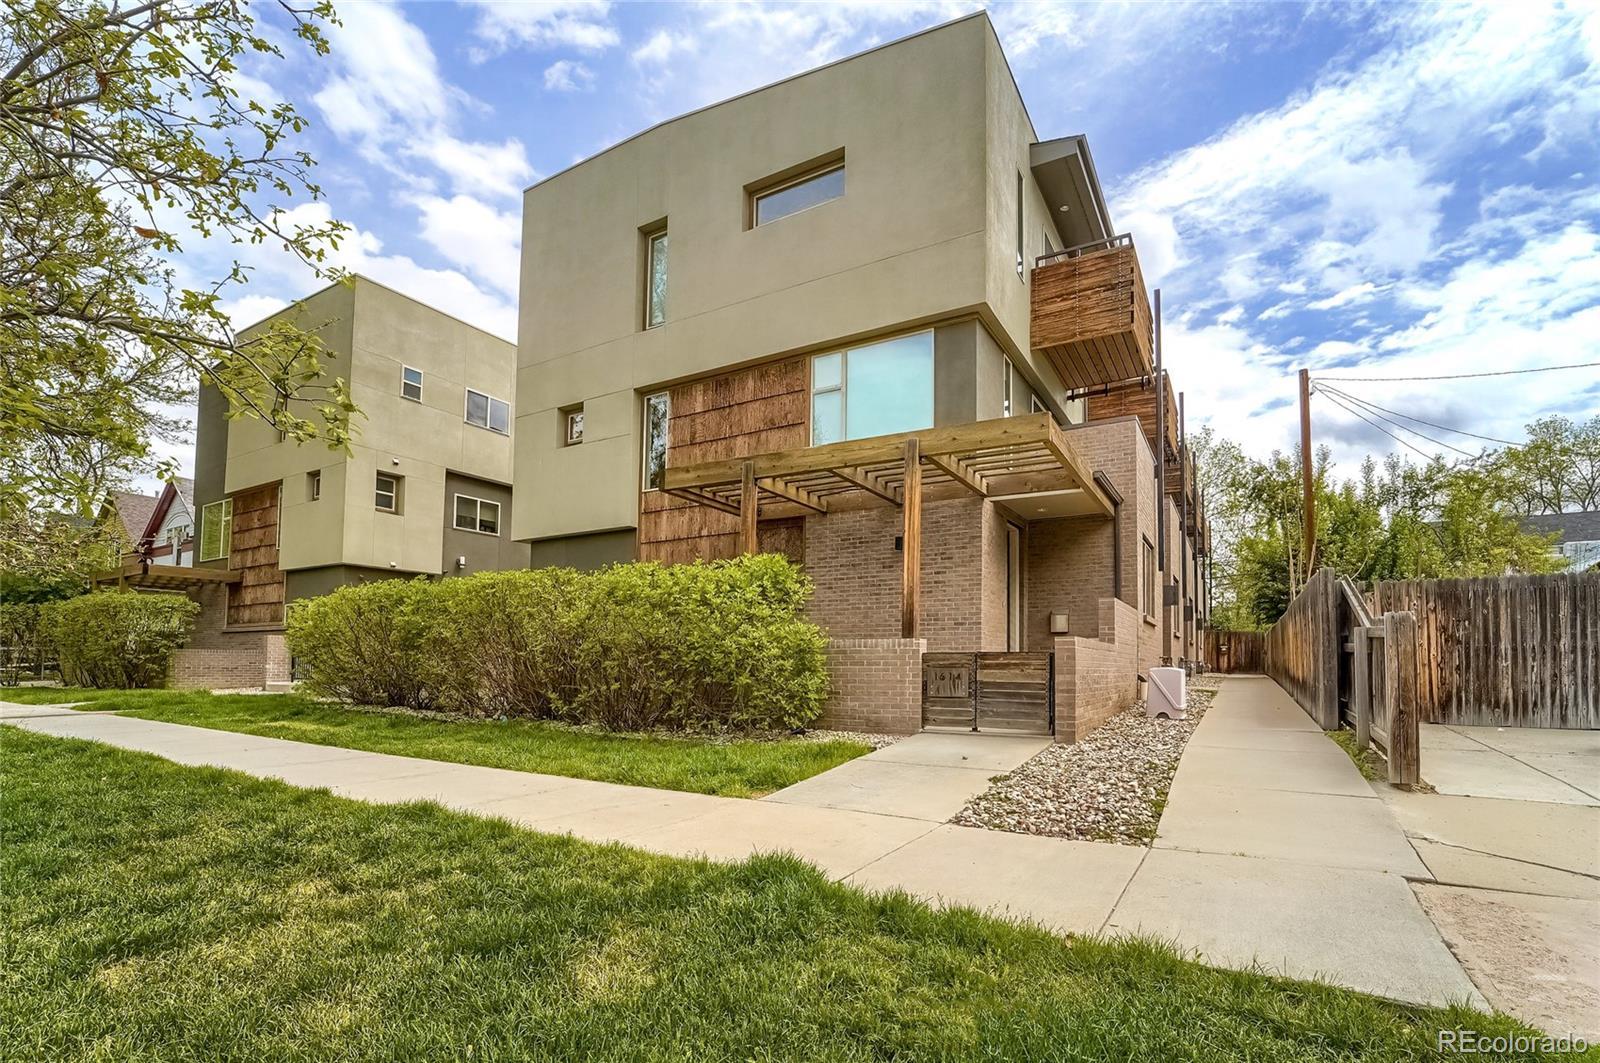 MLS# 9910965 - 3 - 1620 Gilpin Street, Denver, CO 80218